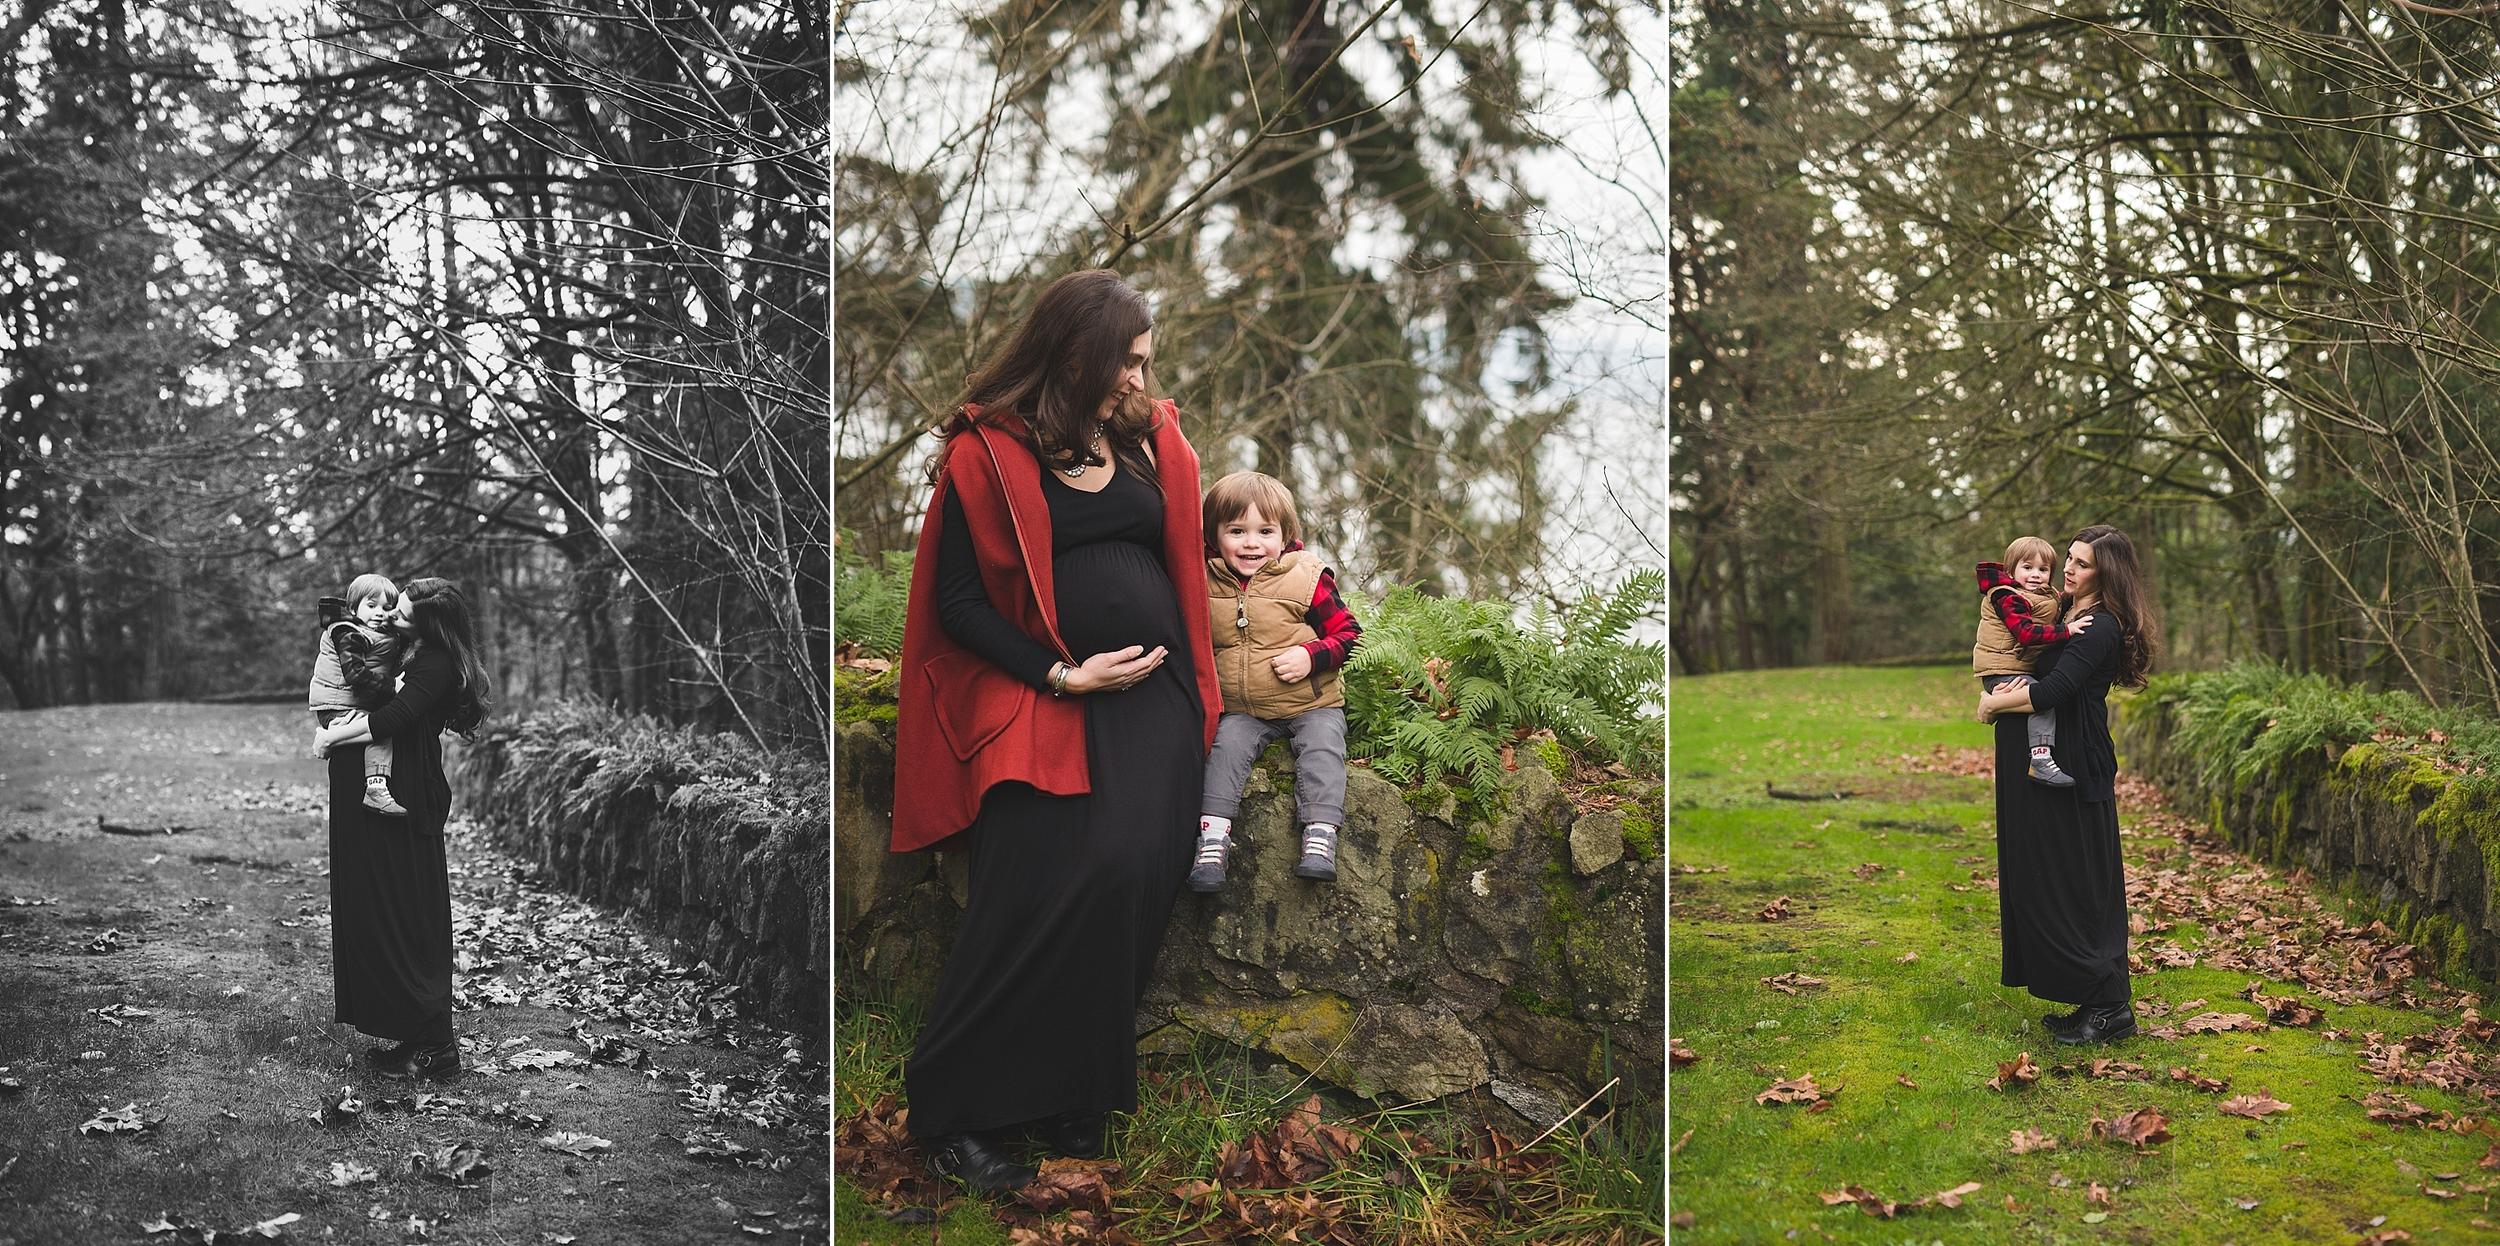 ashley vos photography seattle area lifestyle family maternity photographer_0281.jpg